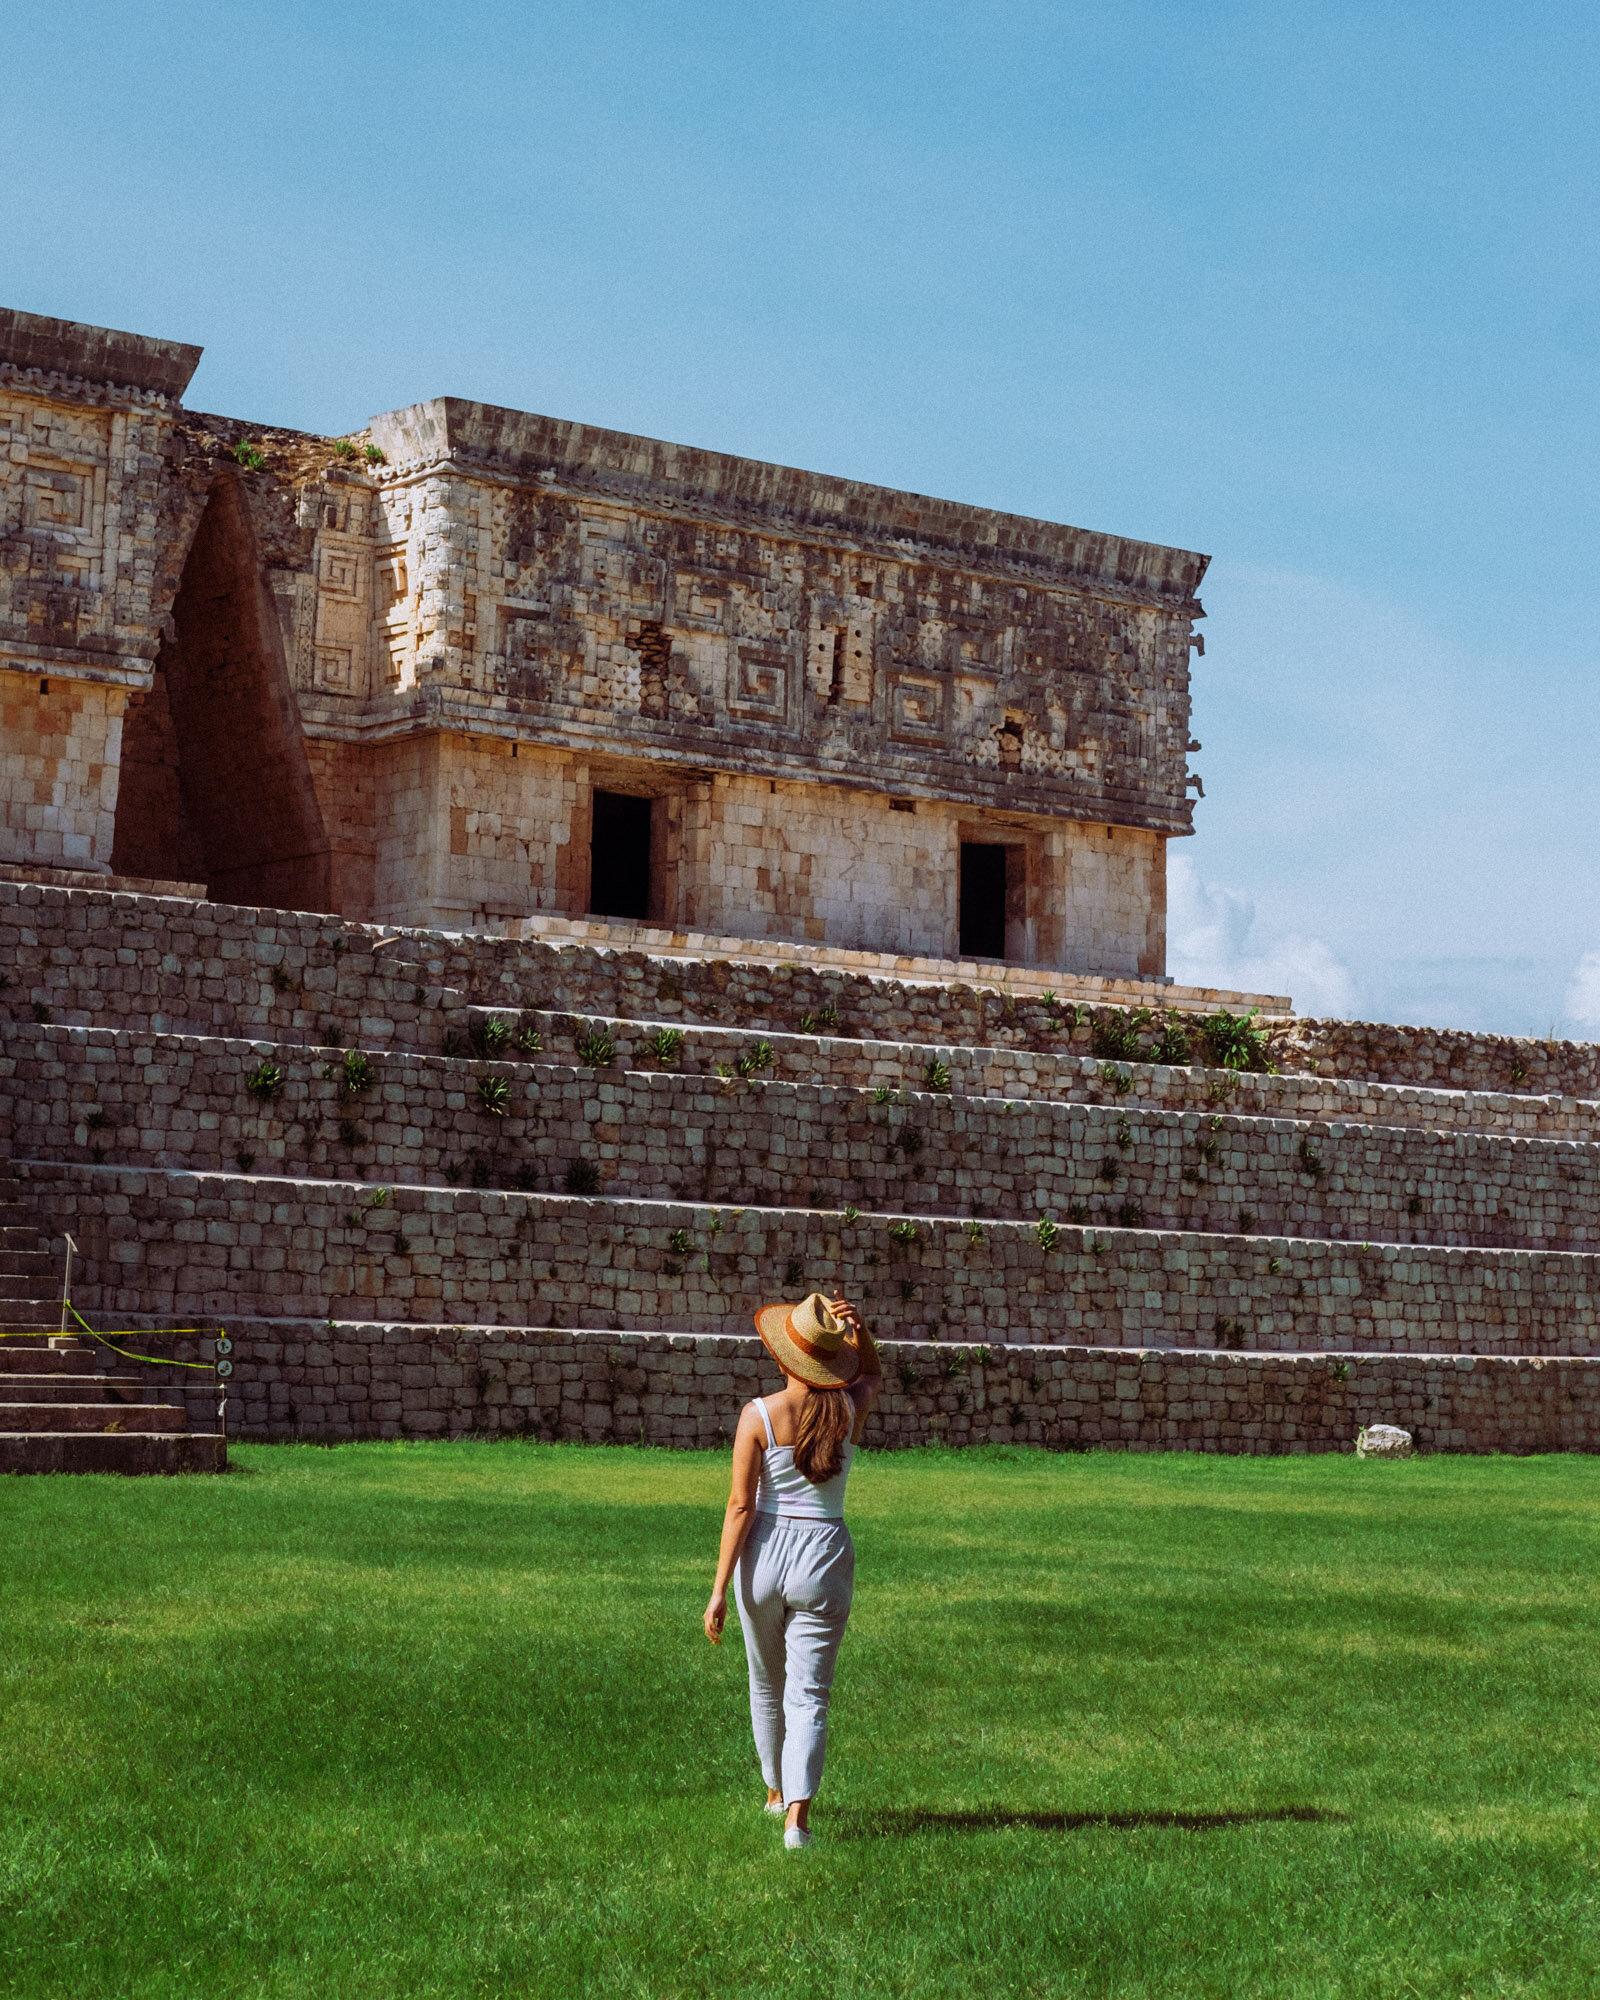 Rachel Off Duty: Woman Exploring the Ruins at Uxmal, Mexico